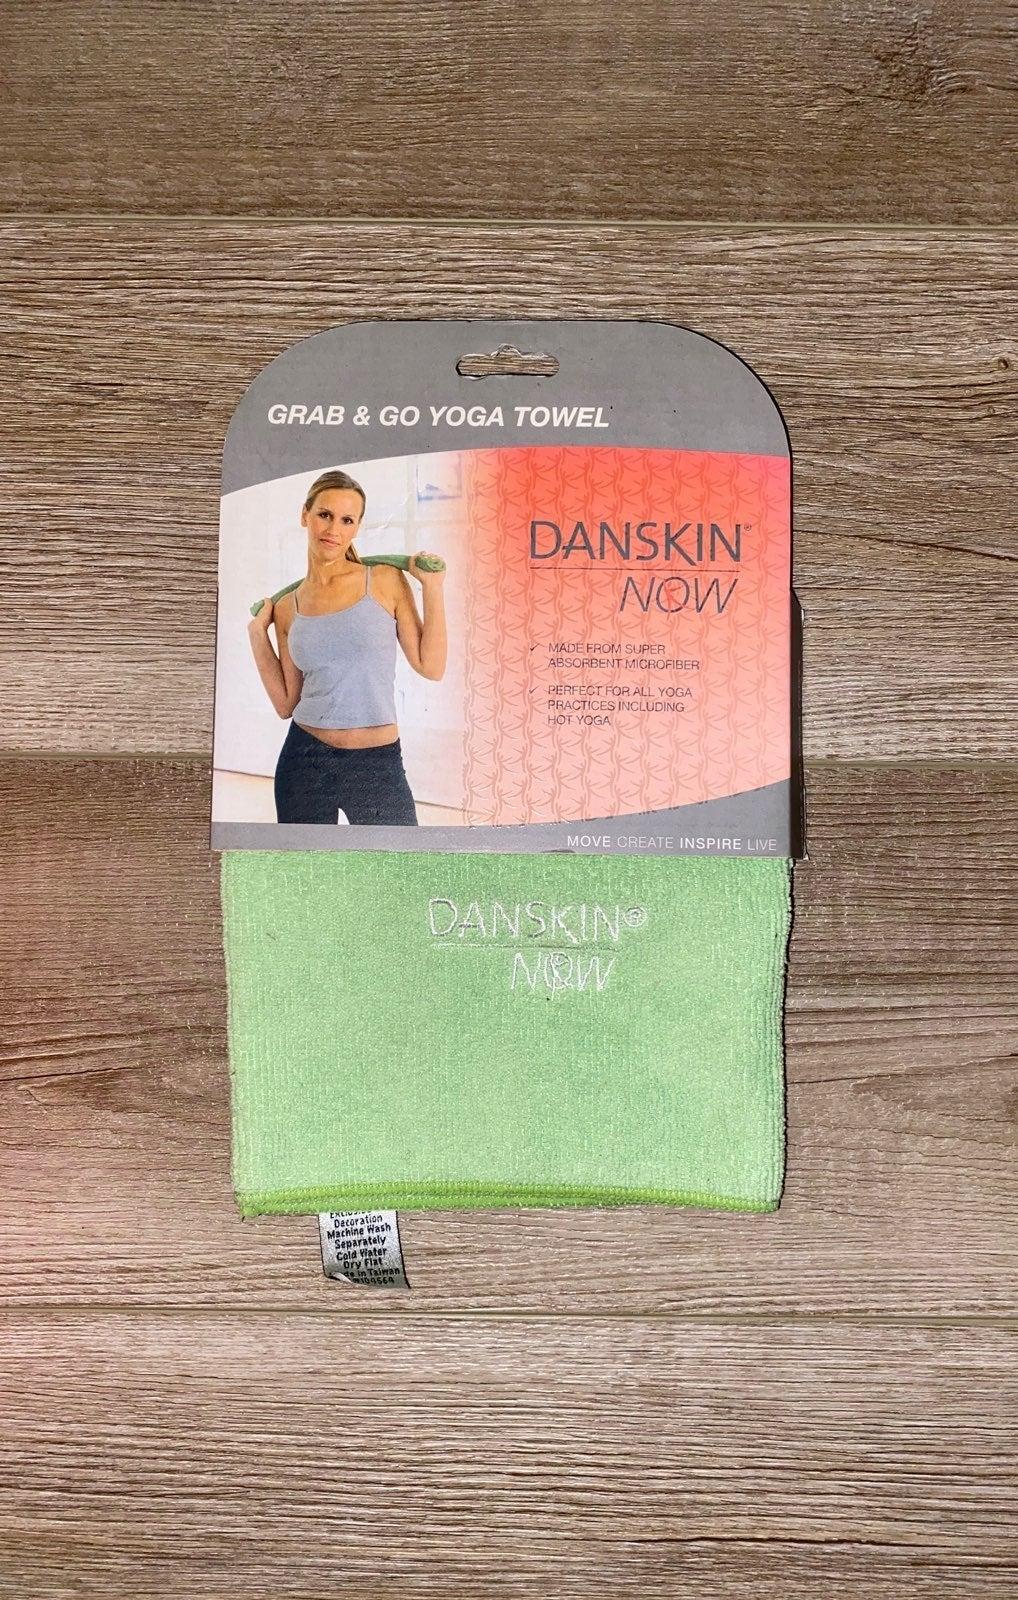 Danskin Now Grab & Go Yoga Towel